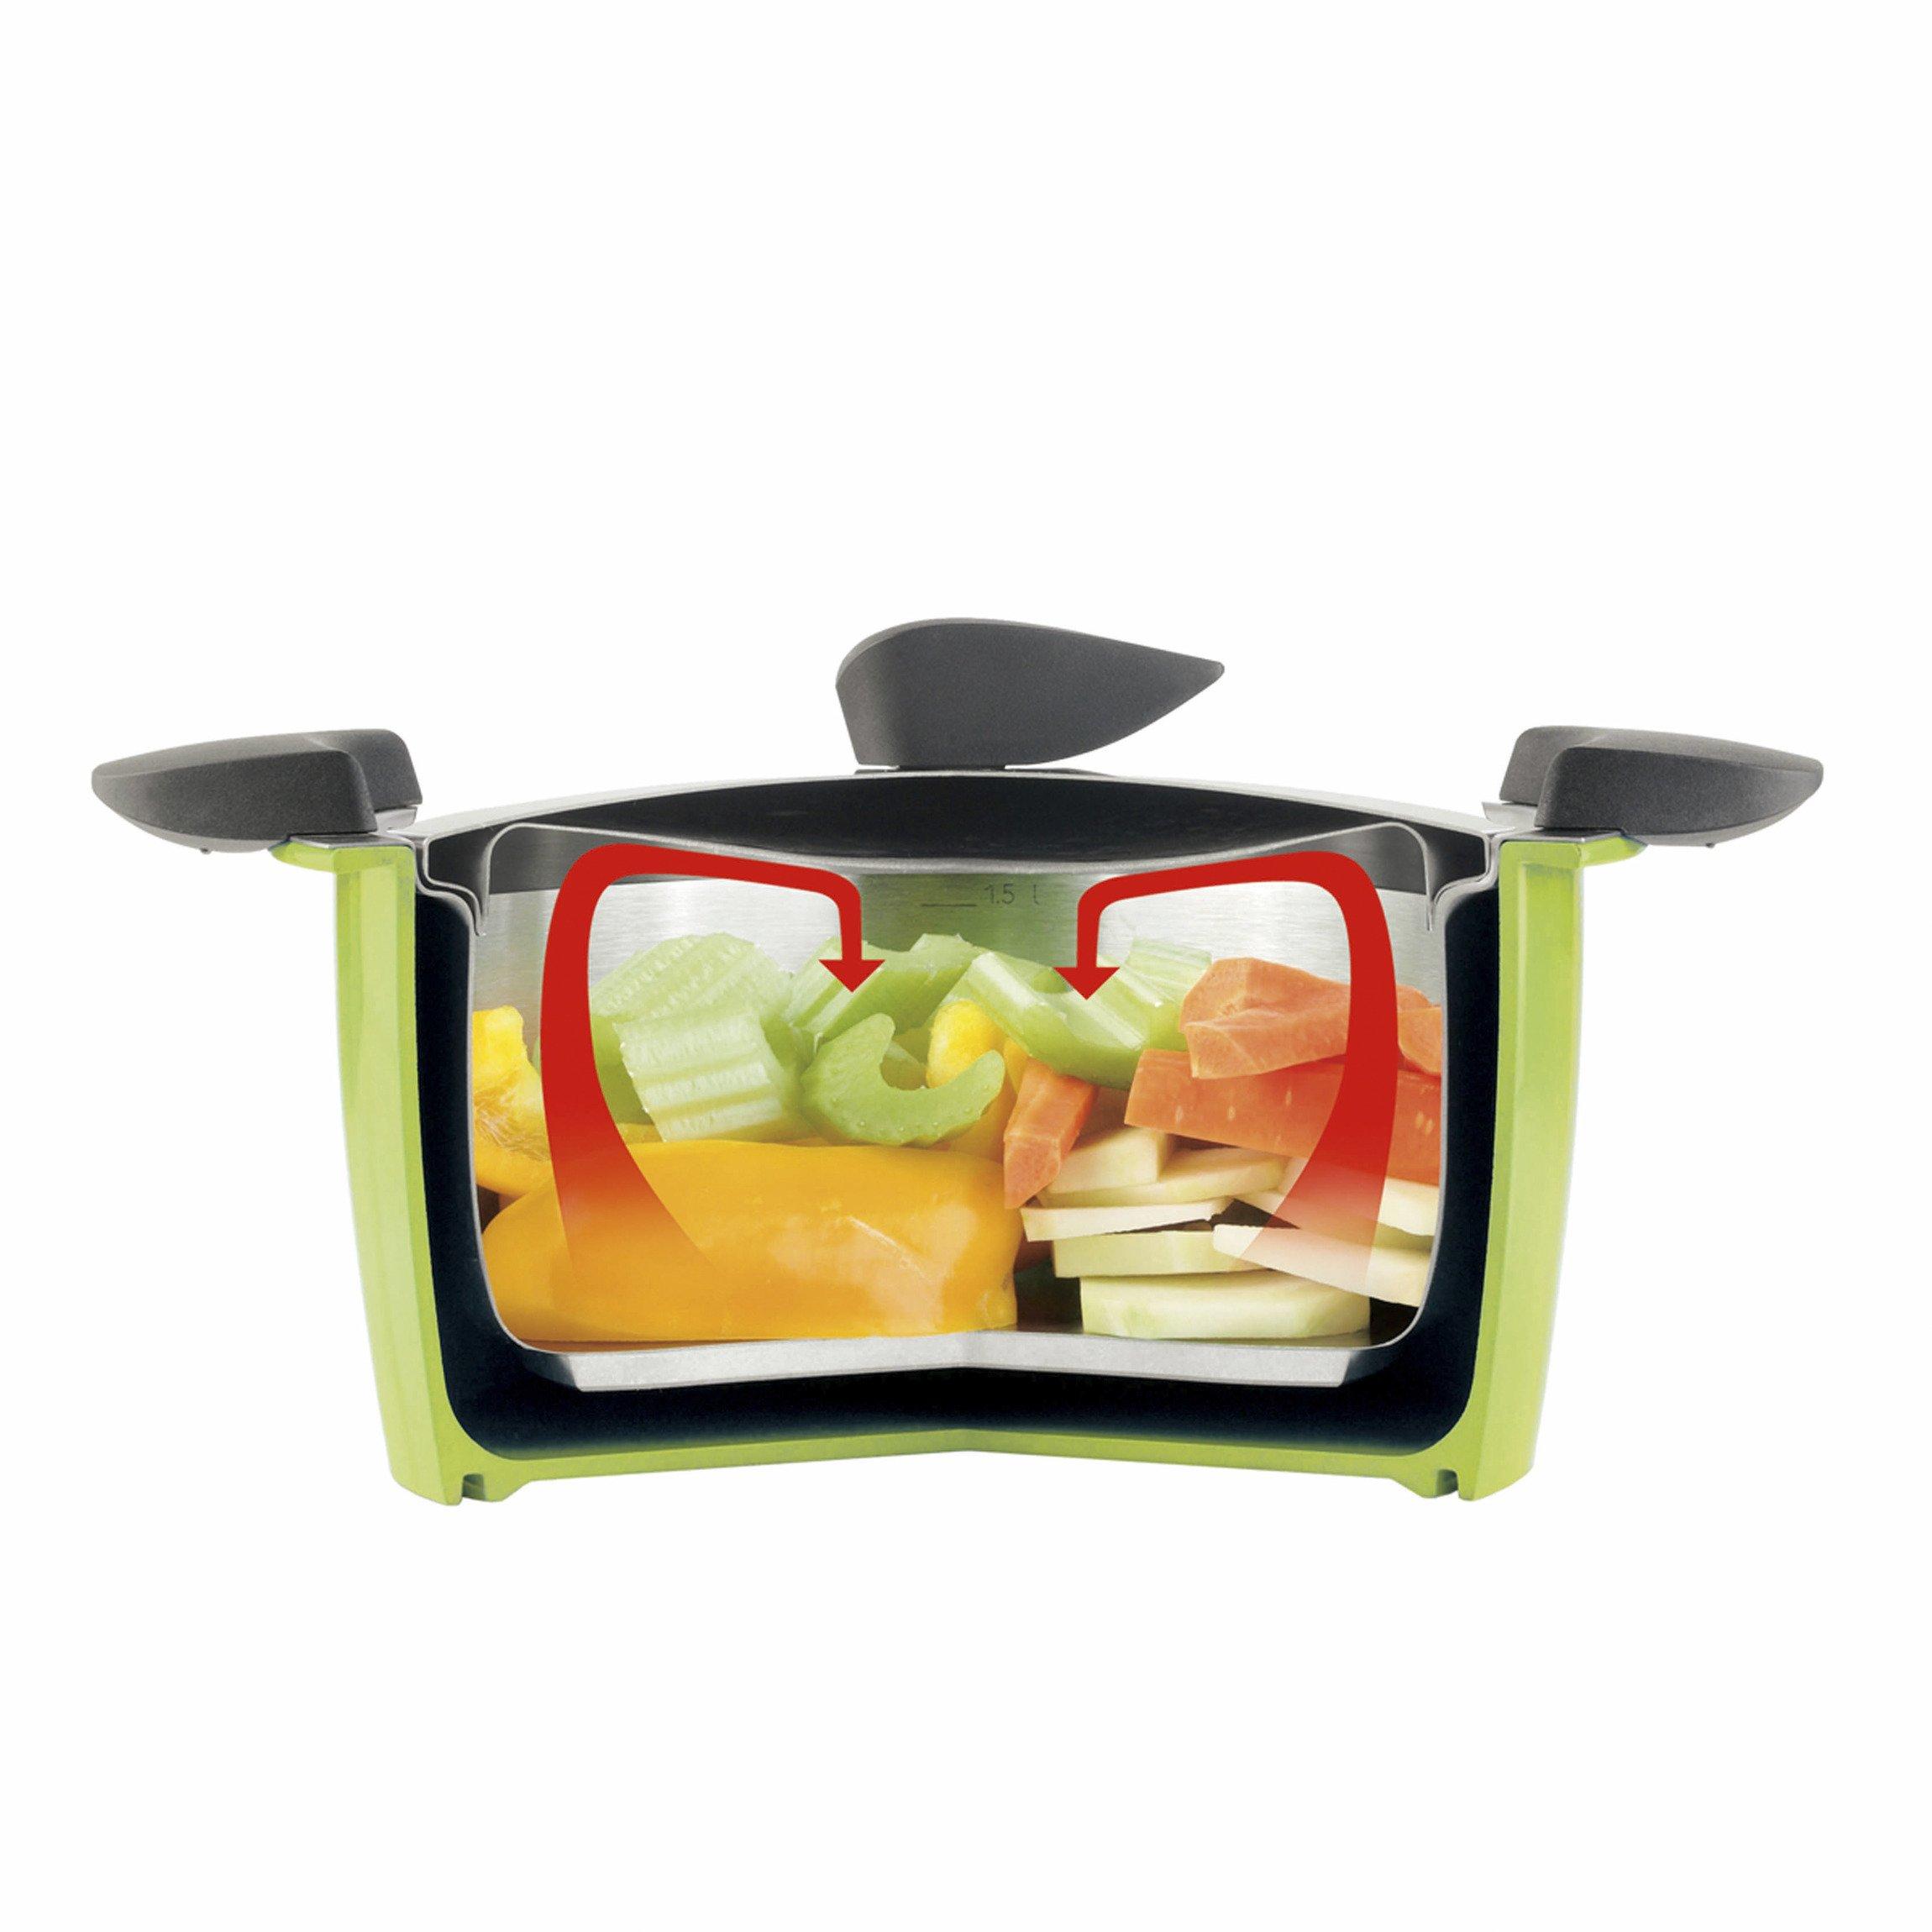 Kuhn Rikon''Hotpan'' 3L Kitchen Starter set, 8.66'', Green/Blue